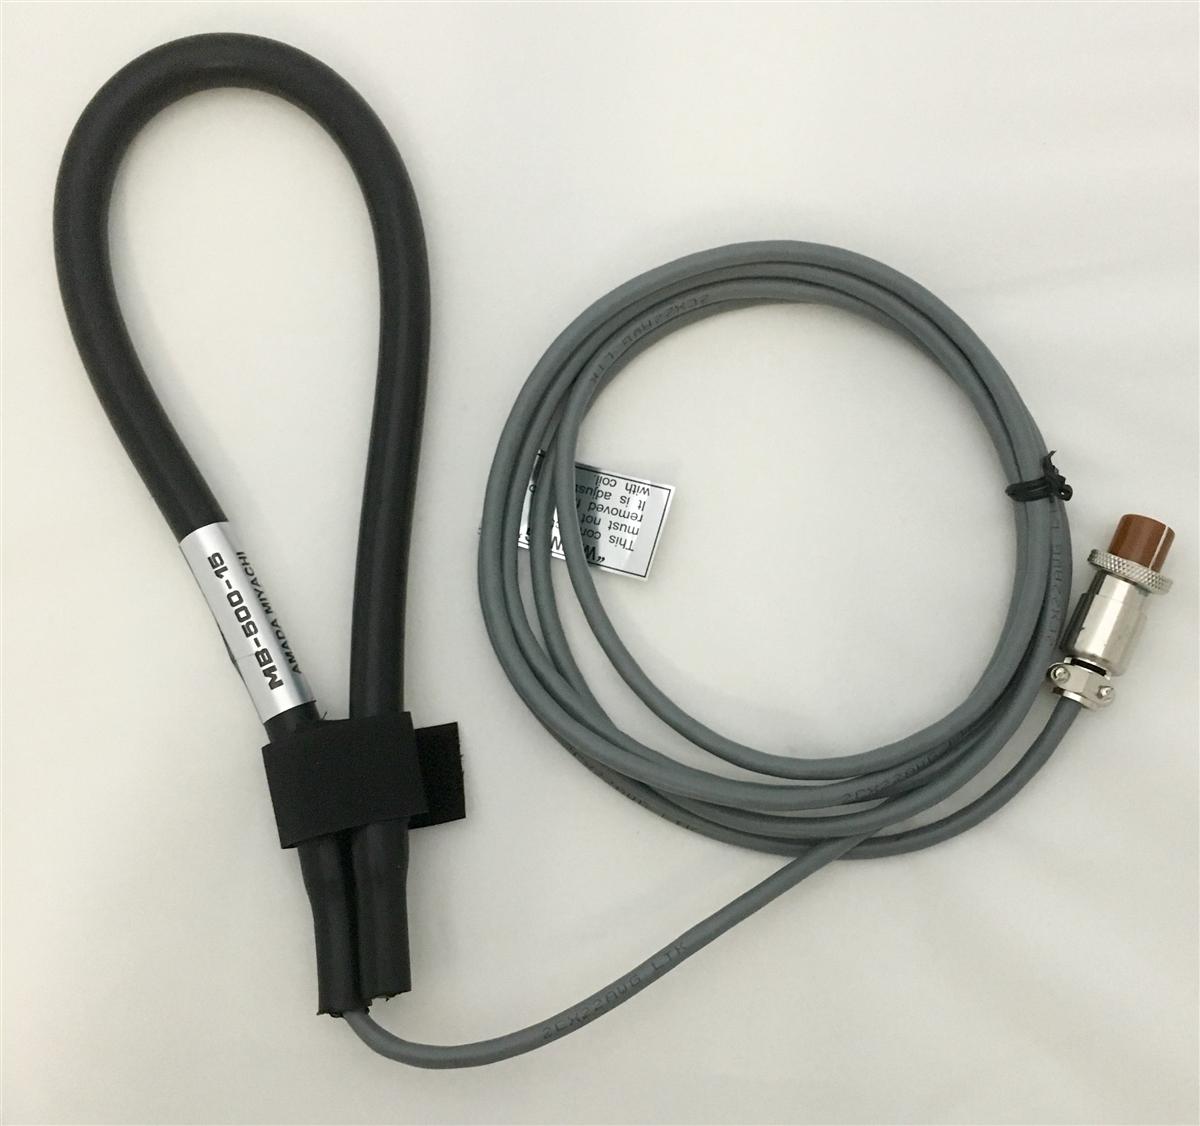 Cảm biến đo dòng điện MB-500-15-00 Amada